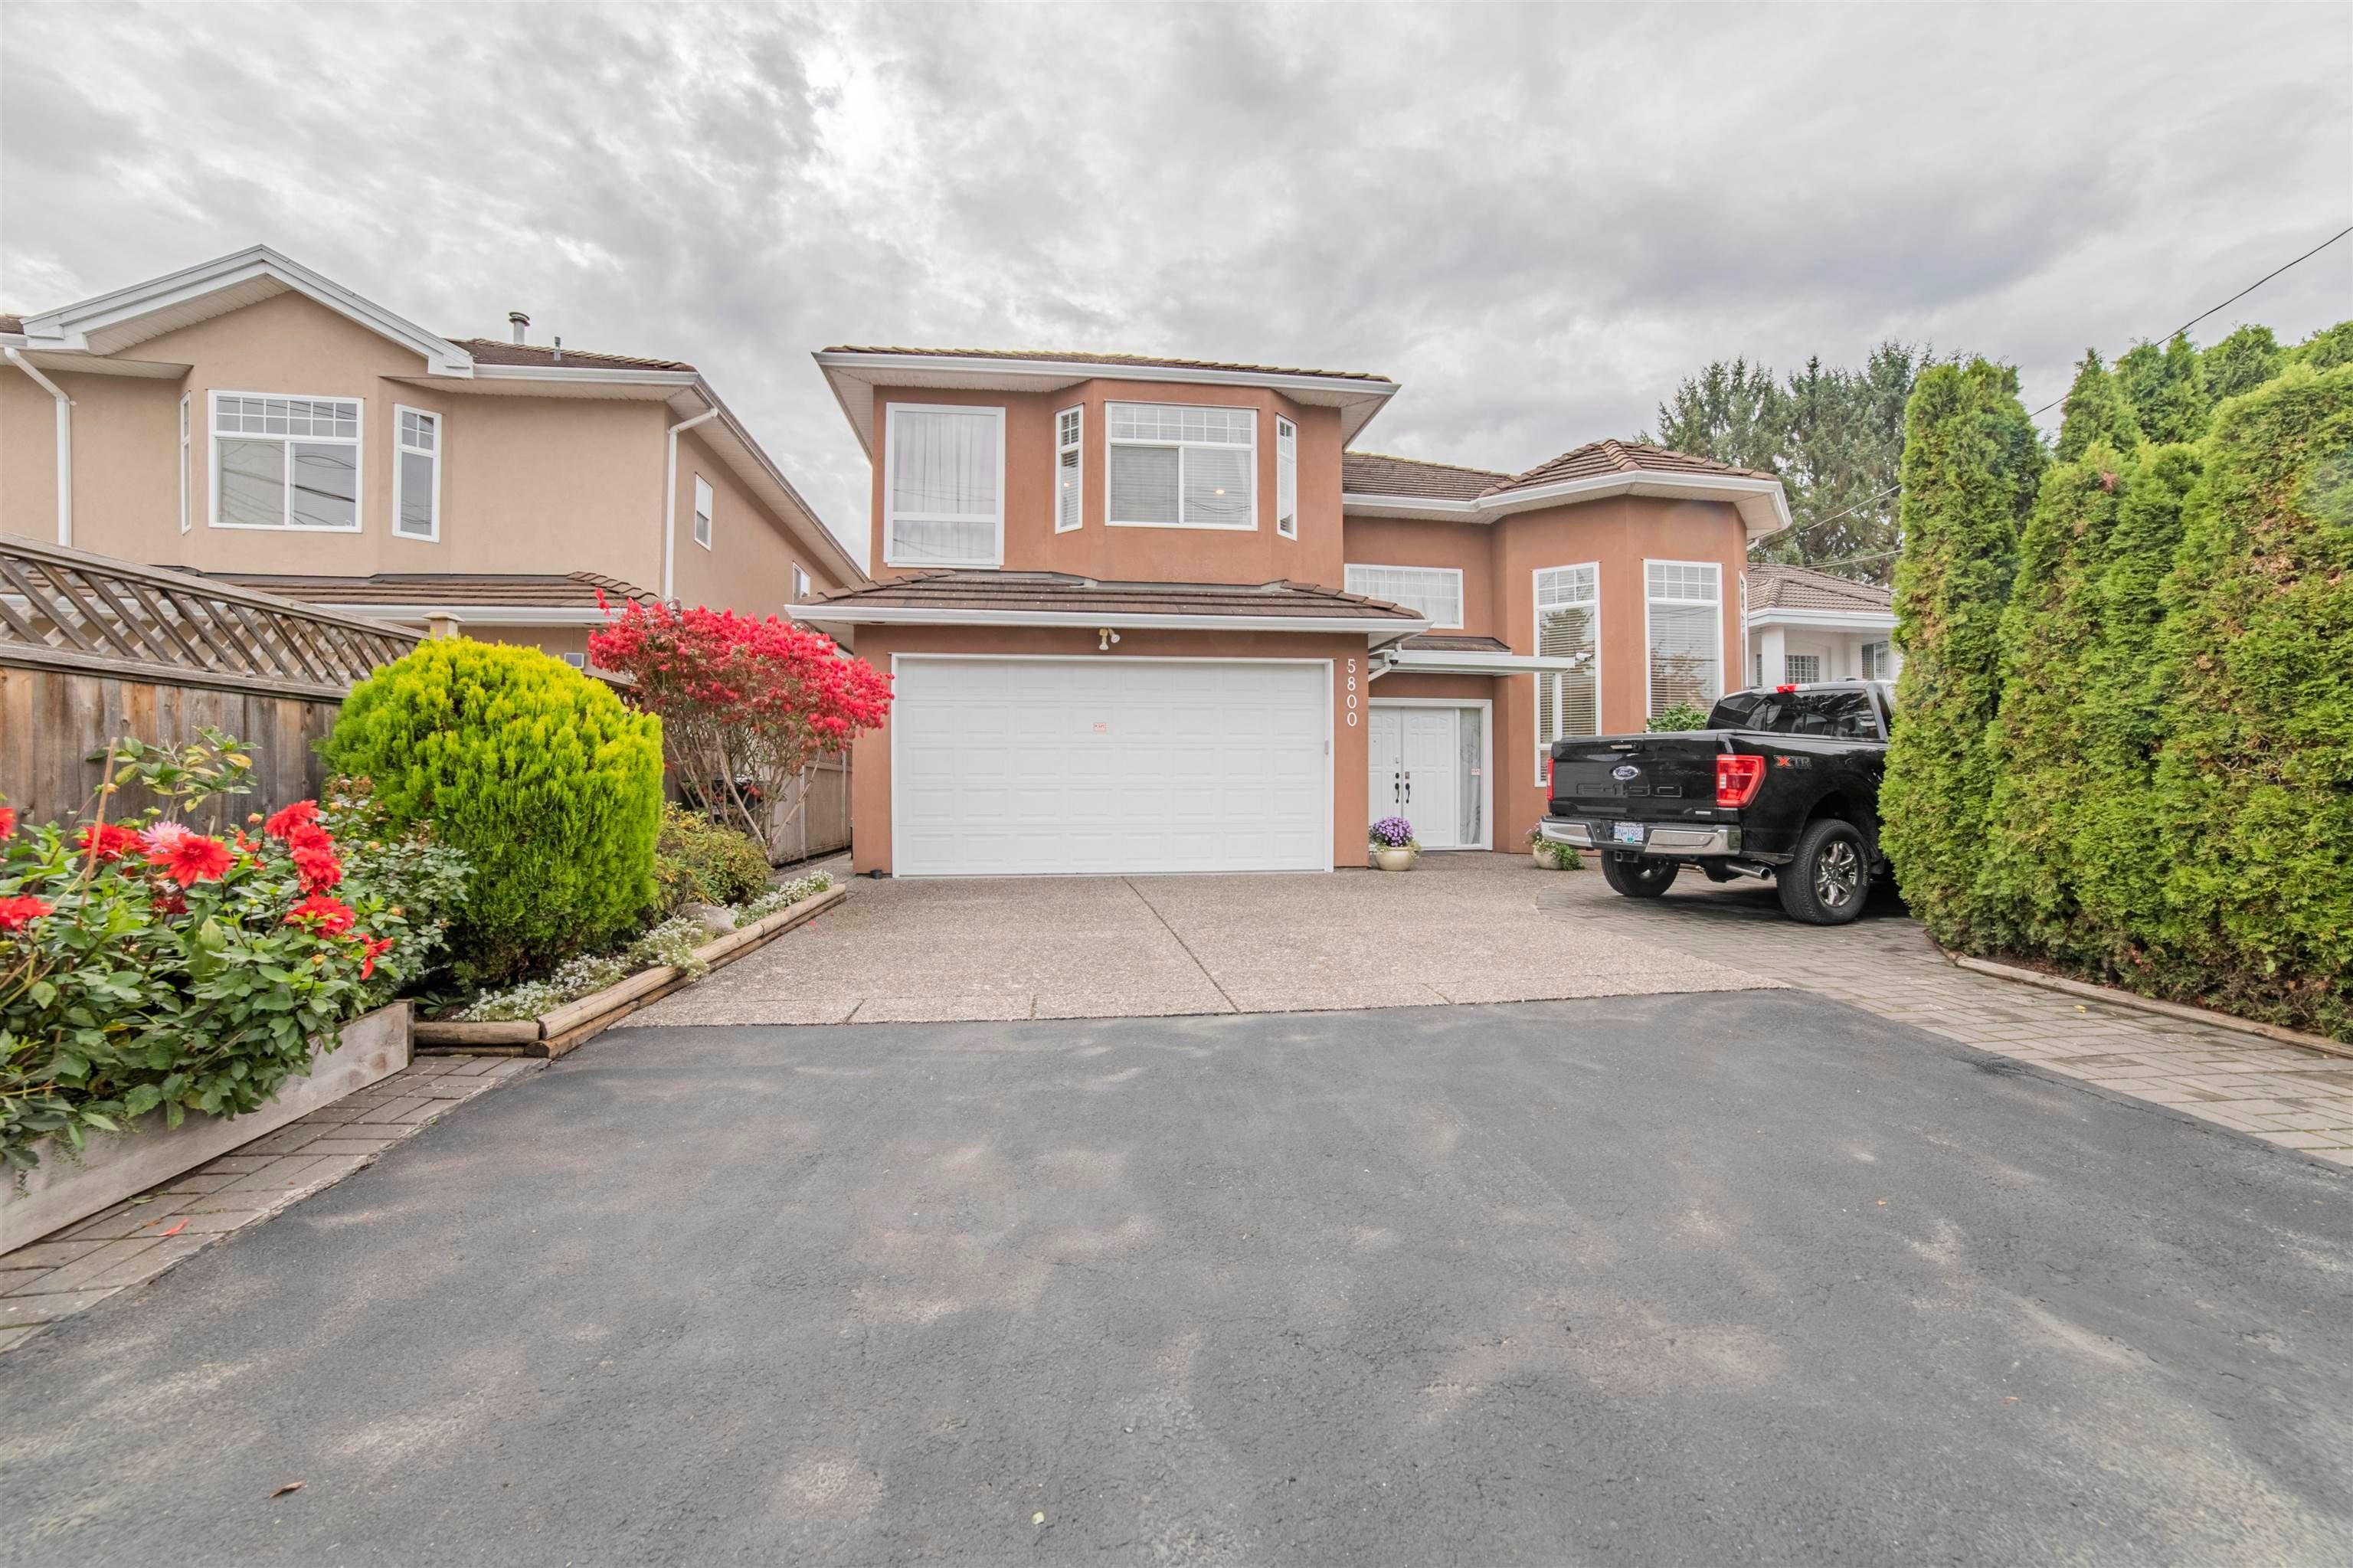 5800 WALTON ROAD - Riverdale RI House/Single Family for sale, 5 Bedrooms (R2624803)